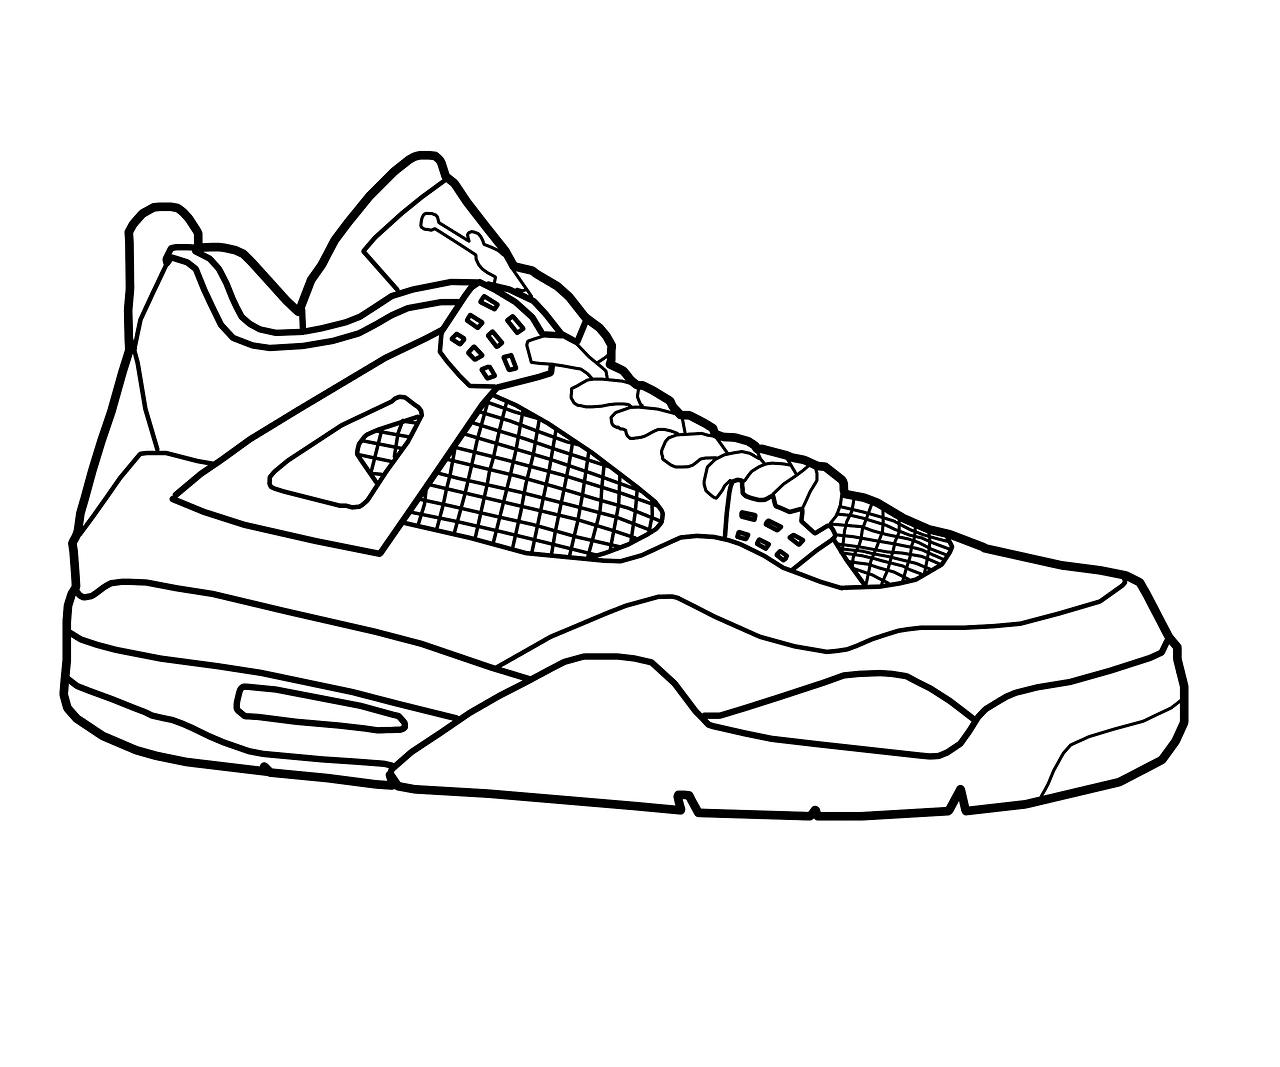 صفر اعادة تشكيل تذكر Nike Air Force One Coloring Page Pleasantgroveumc Net